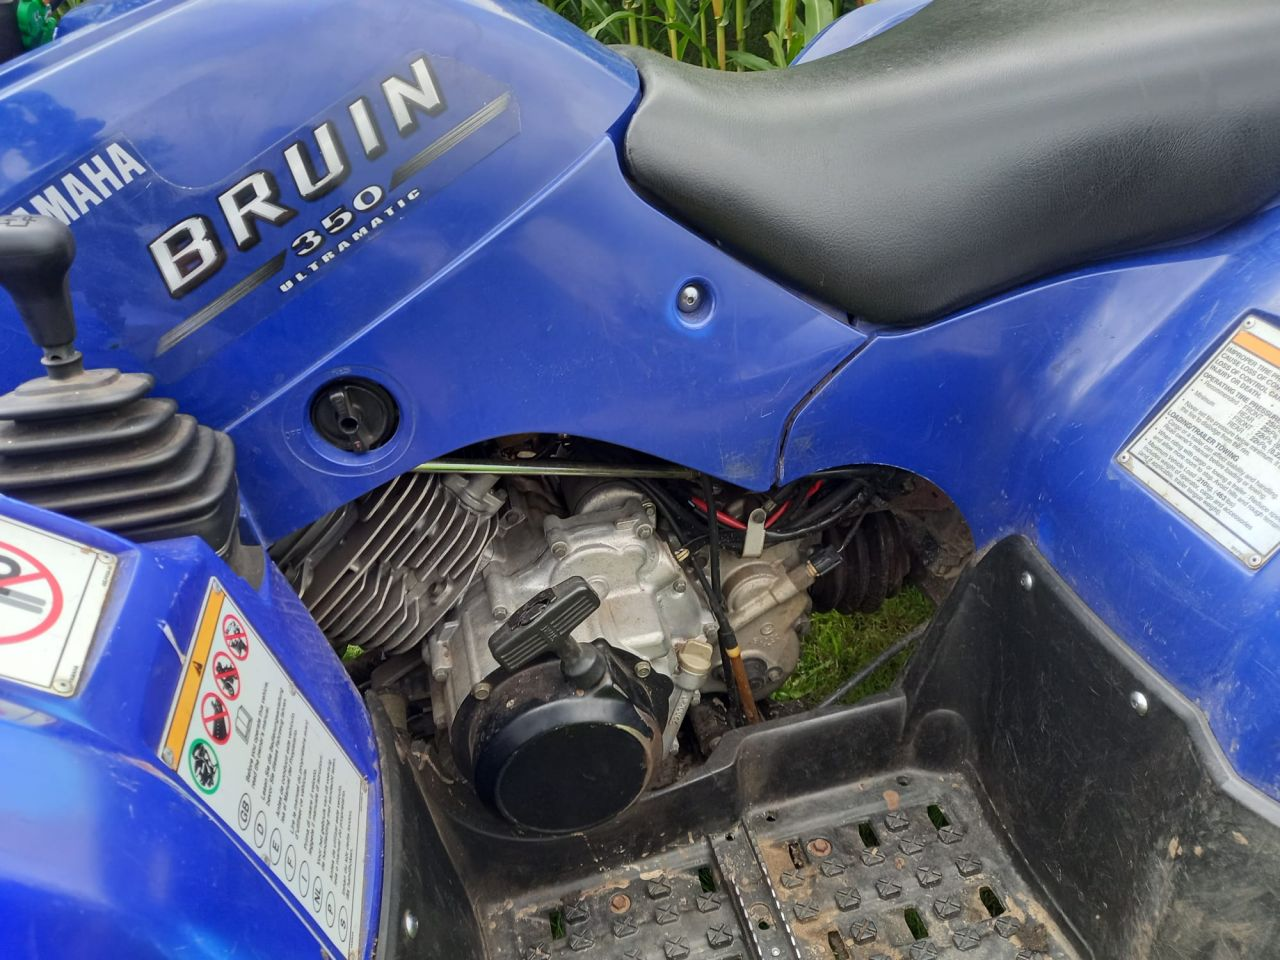 Yamaha grizzly Bruin 350